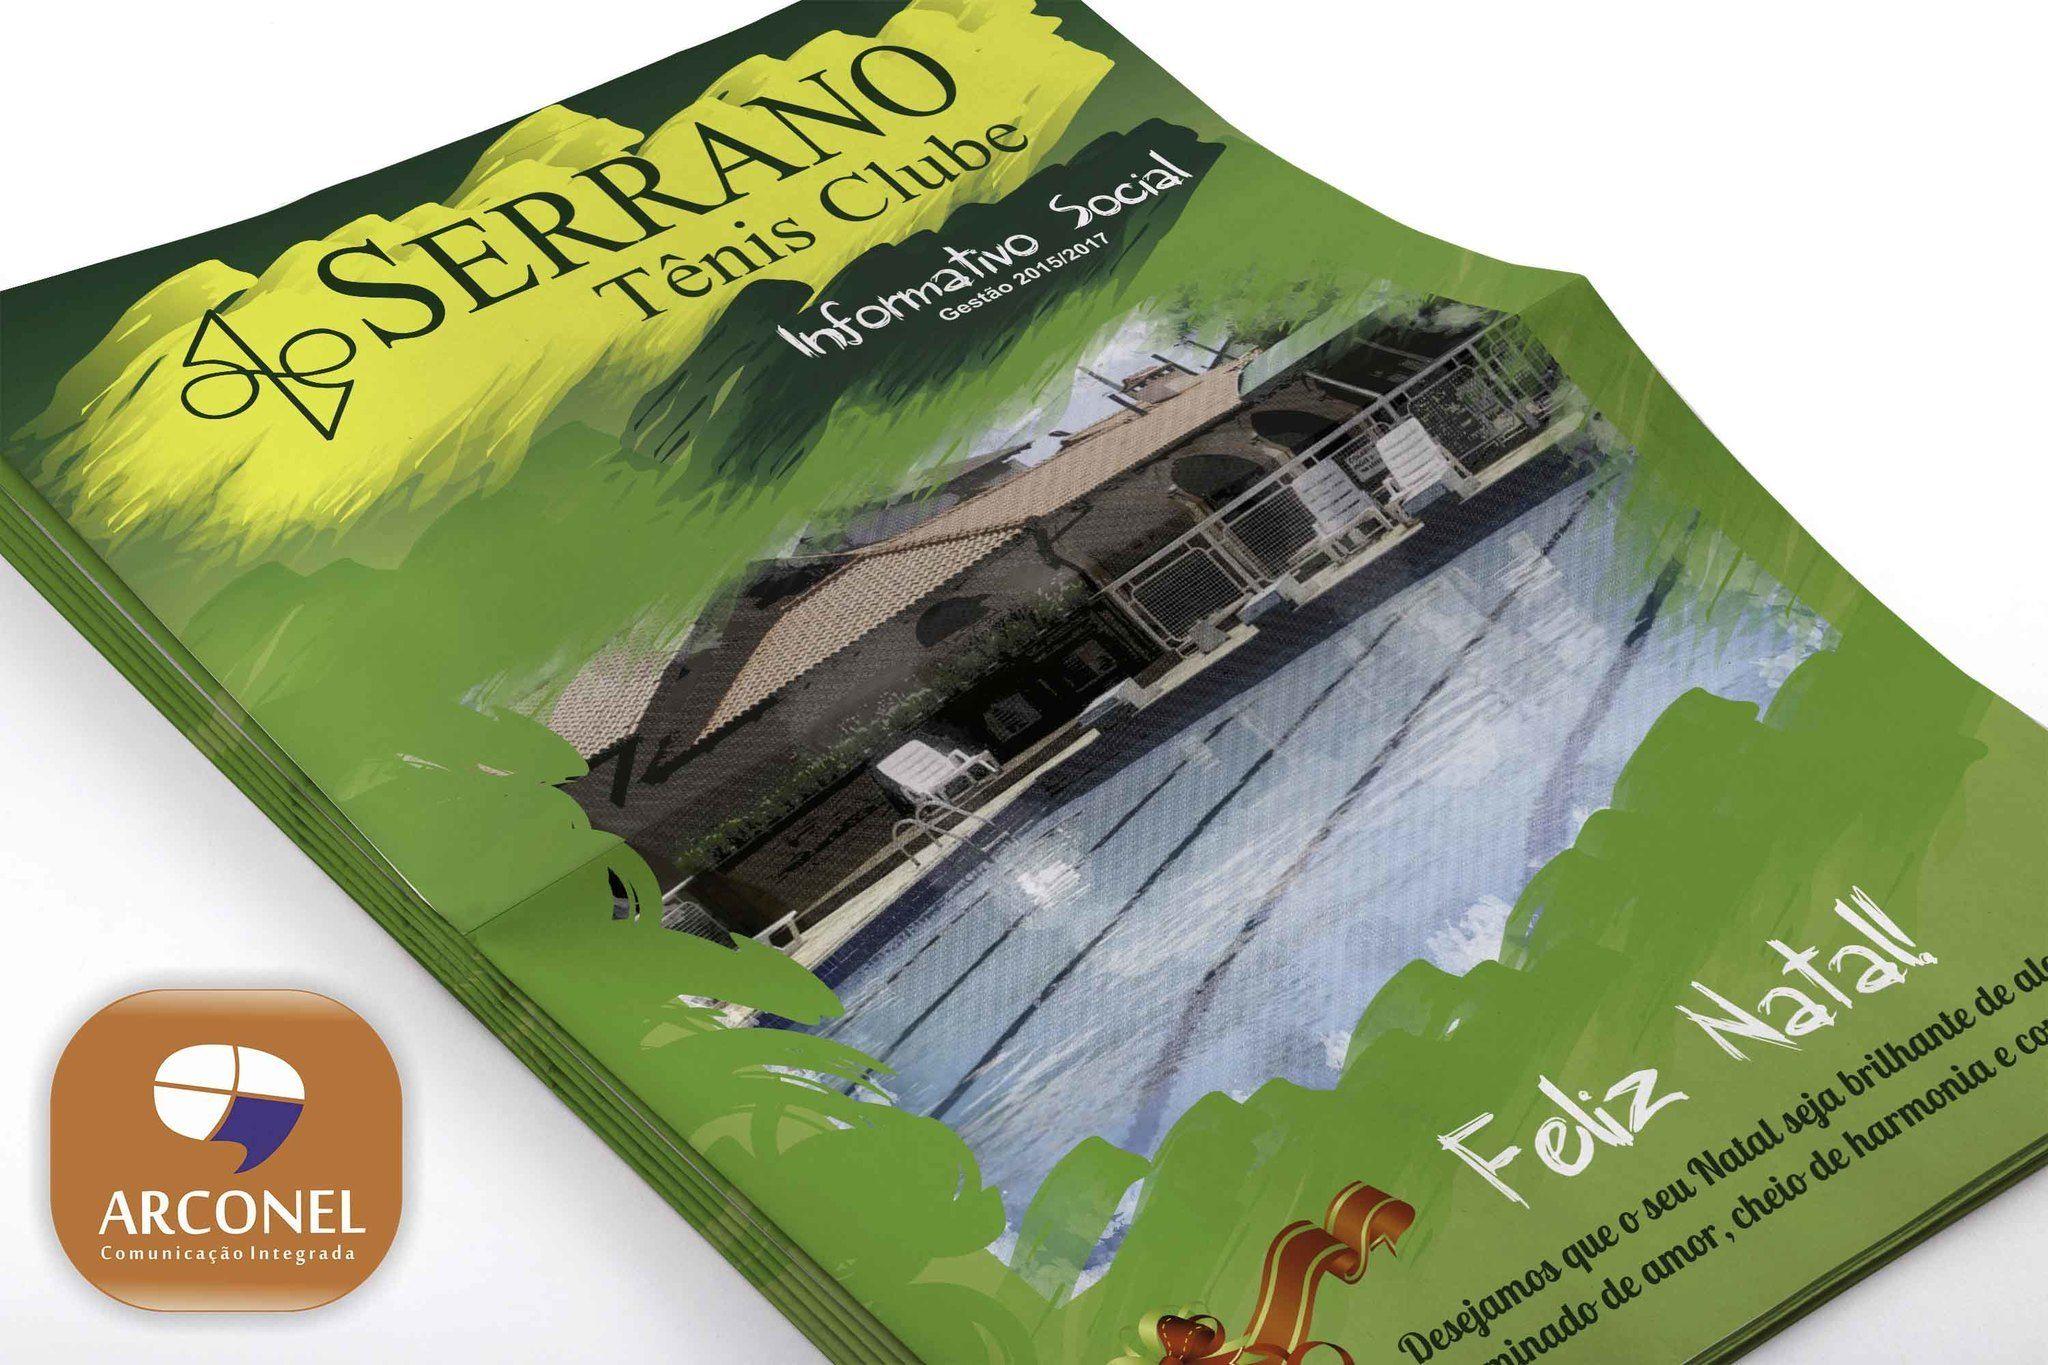 Informativo Social - Serrano Tênis Clube - Click neste link para ver https://goo.gl/2Iwxp #Serrano #Arconel #informativo #Clube #Lazer